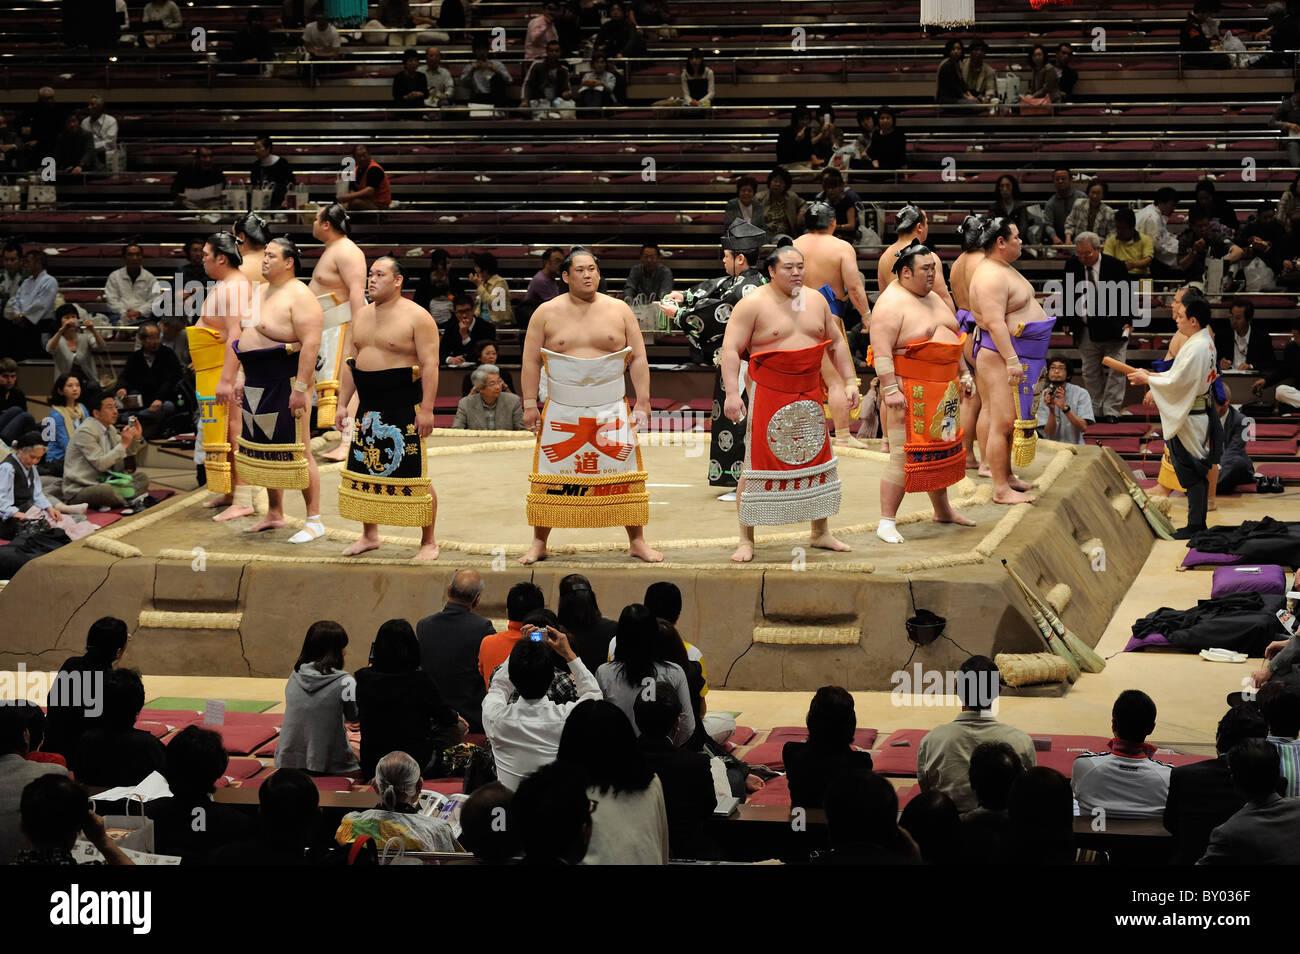 Lottatori Juryo cerimoniale di ingresso, Grandi Campionati di Sumo maggio 2010, Ryogoku Kokugikan, Tokyo, Giappone Immagini Stock